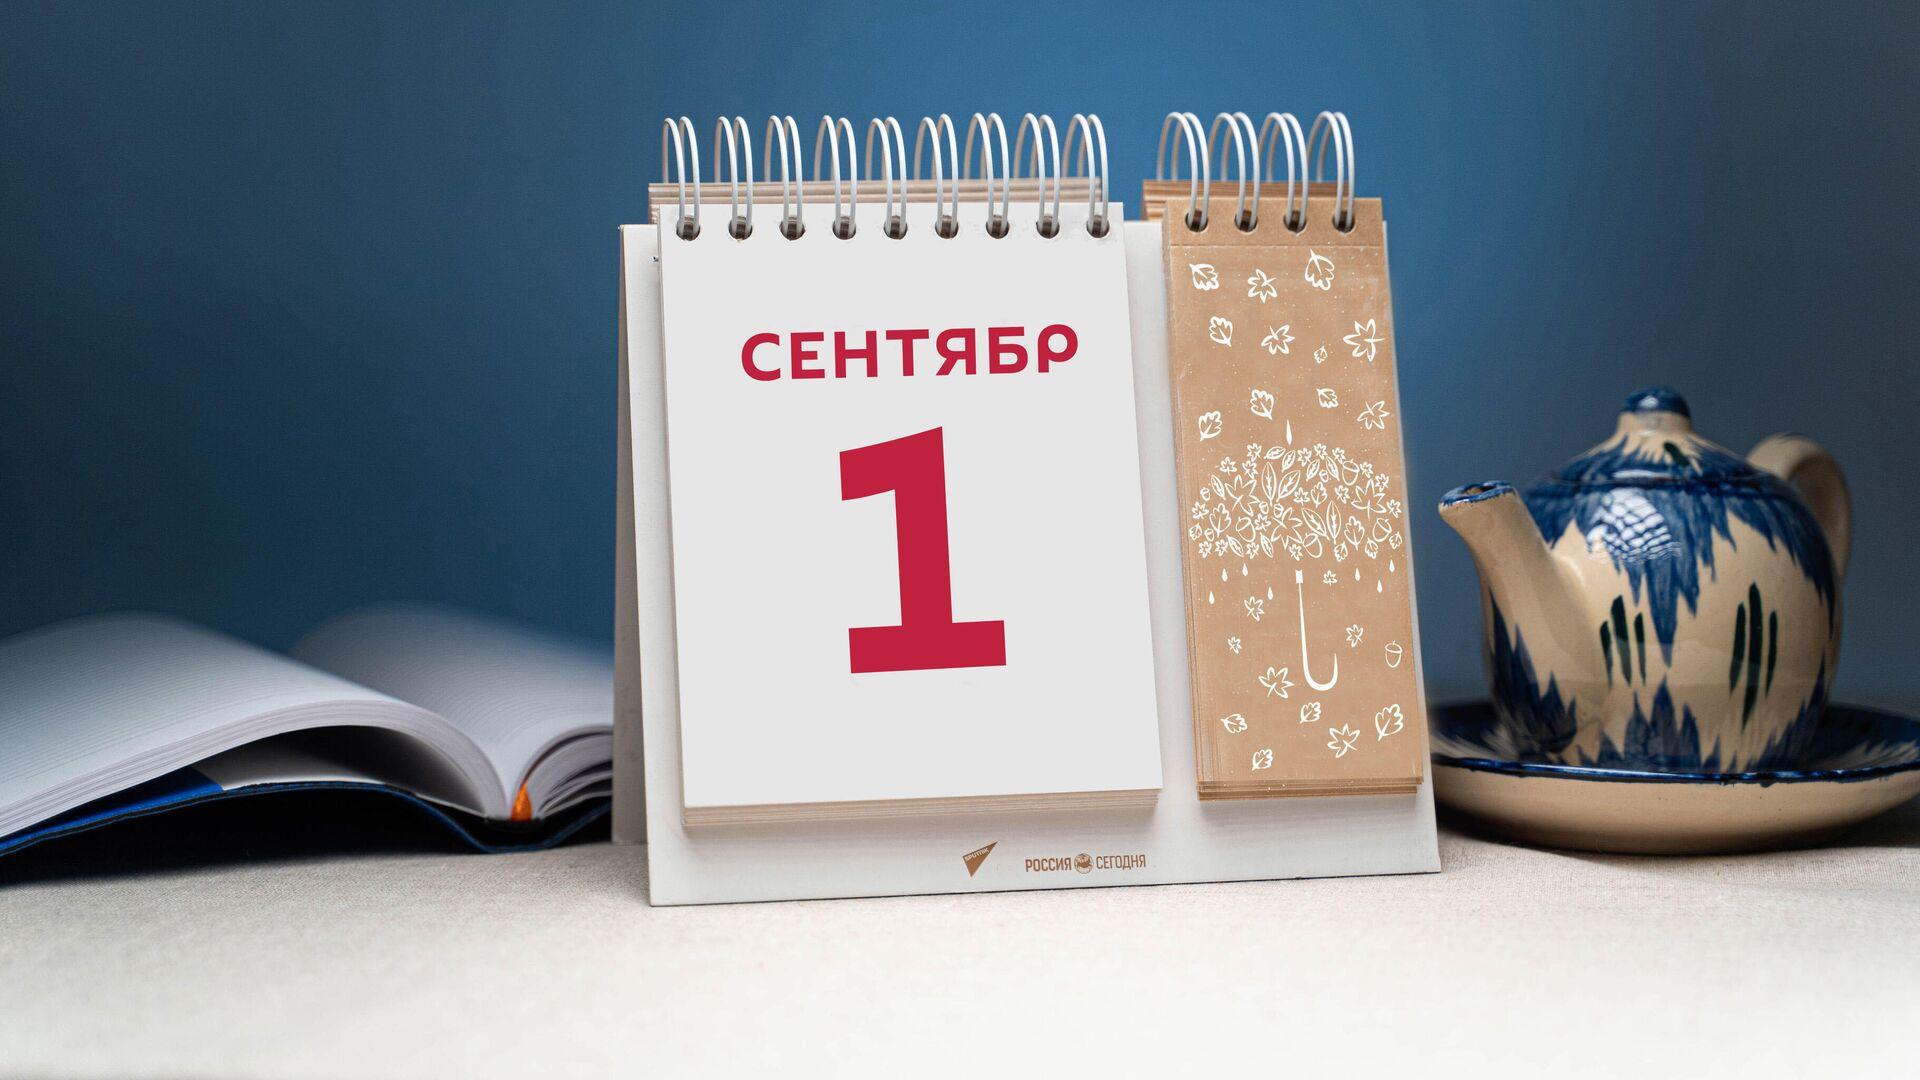 День 1 сентября - Sputnik Тоҷикистон, 1920, 01.09.2021